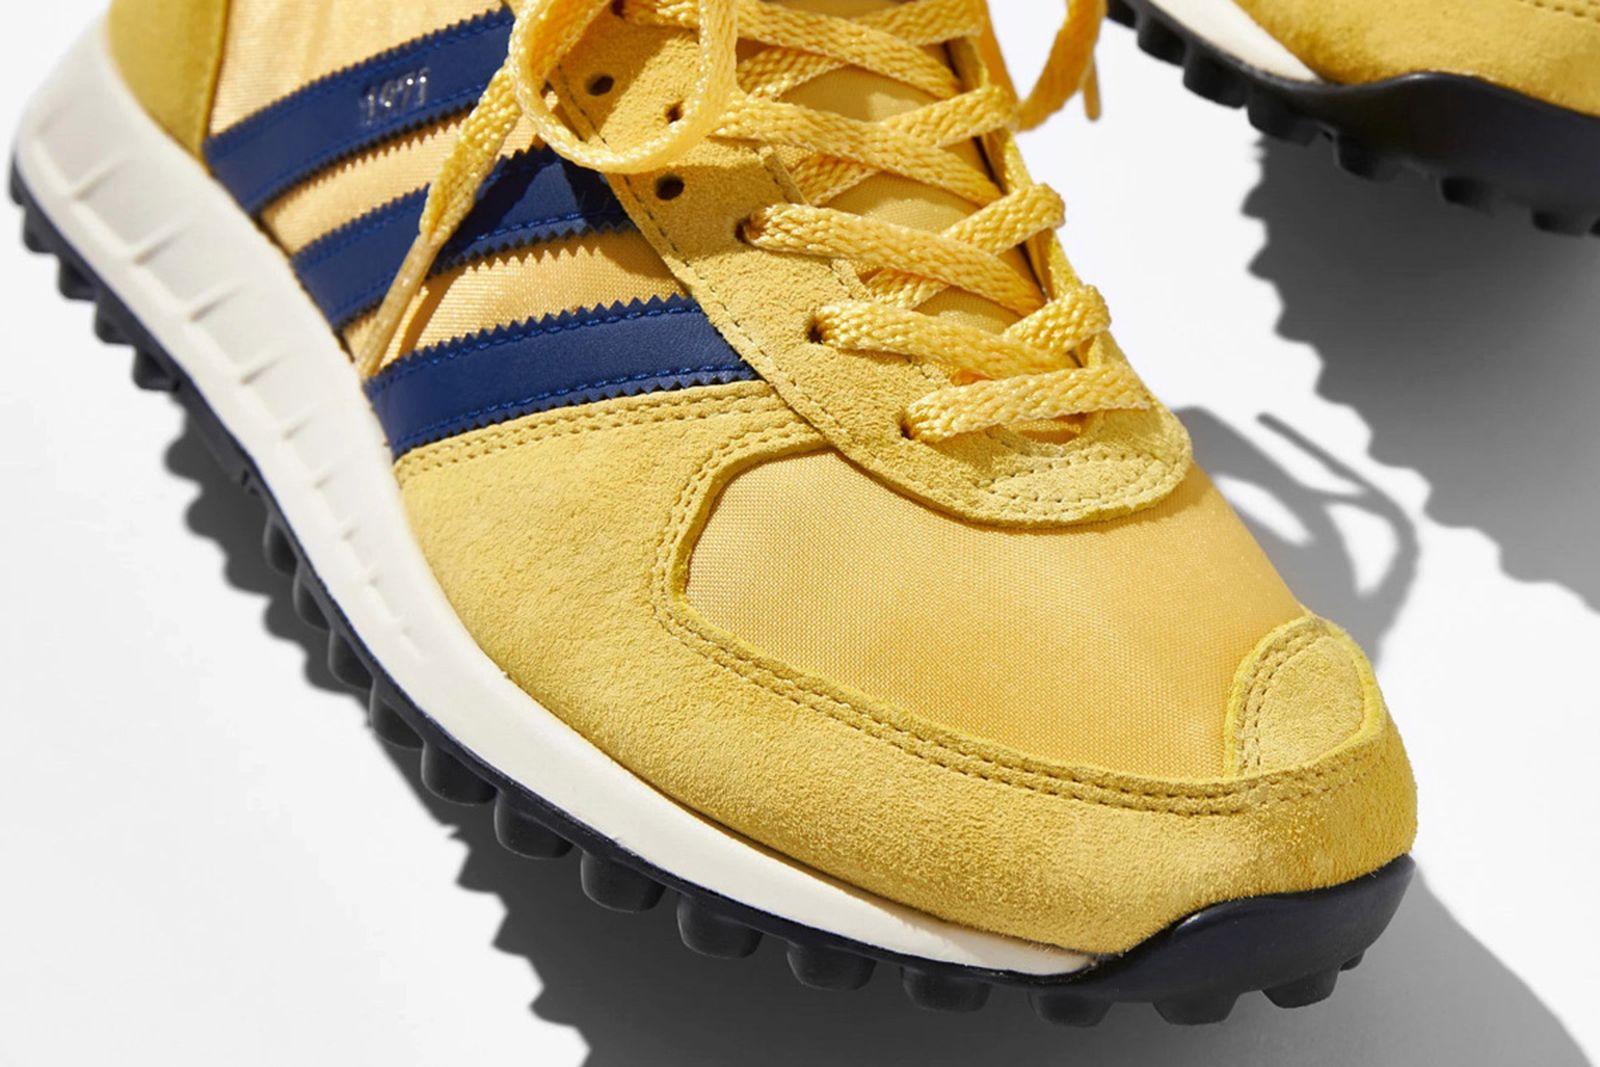 arsenal-adidas-trx-runner-05